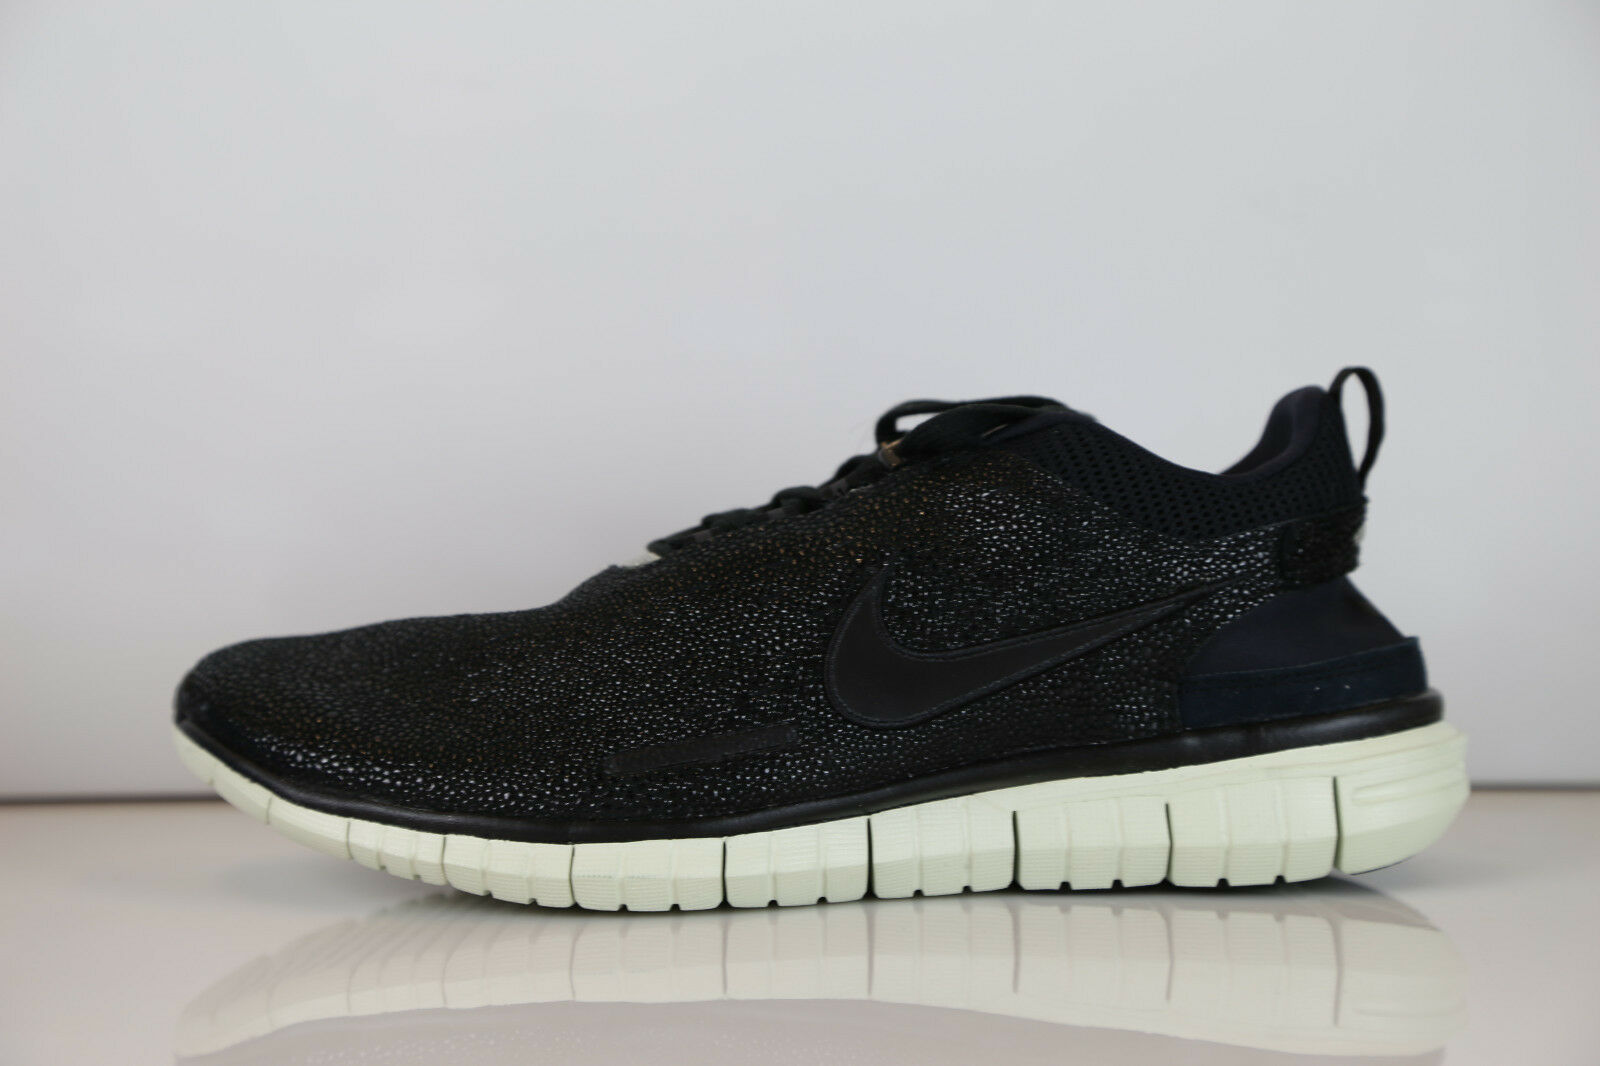 Nike Free OG '14 PA Stingray Black Seaglass 705006-001 11-14 premim 1